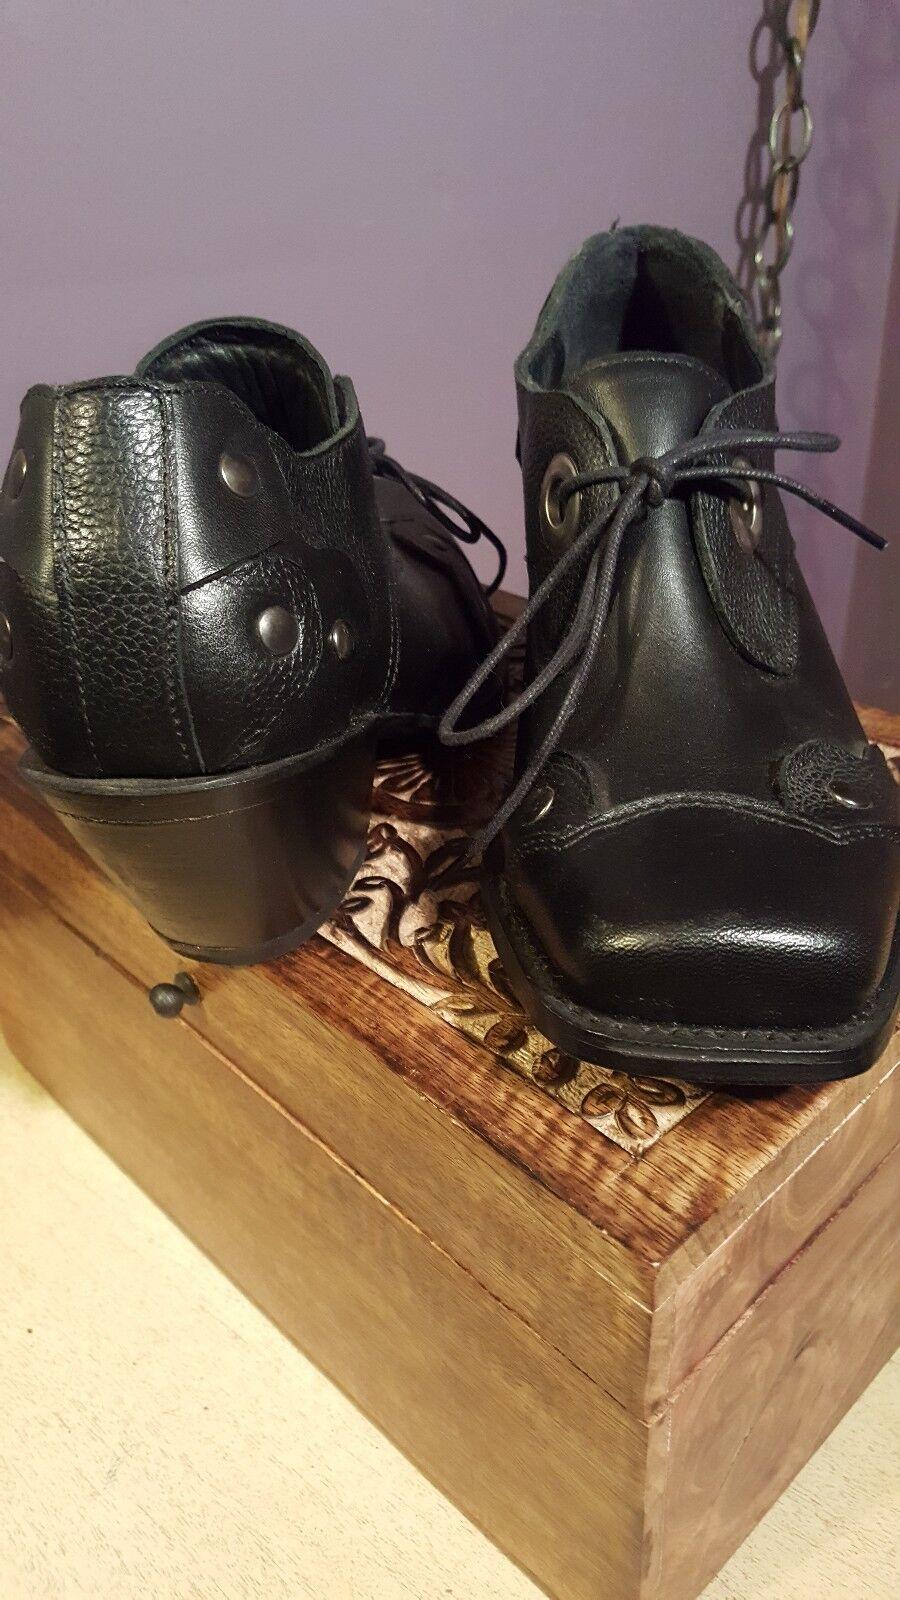 JOHN FLUEVOG FLUEVOG FLUEVOG I BELIEVE Black Leather Sz 7 western ankle boots lace 615b17